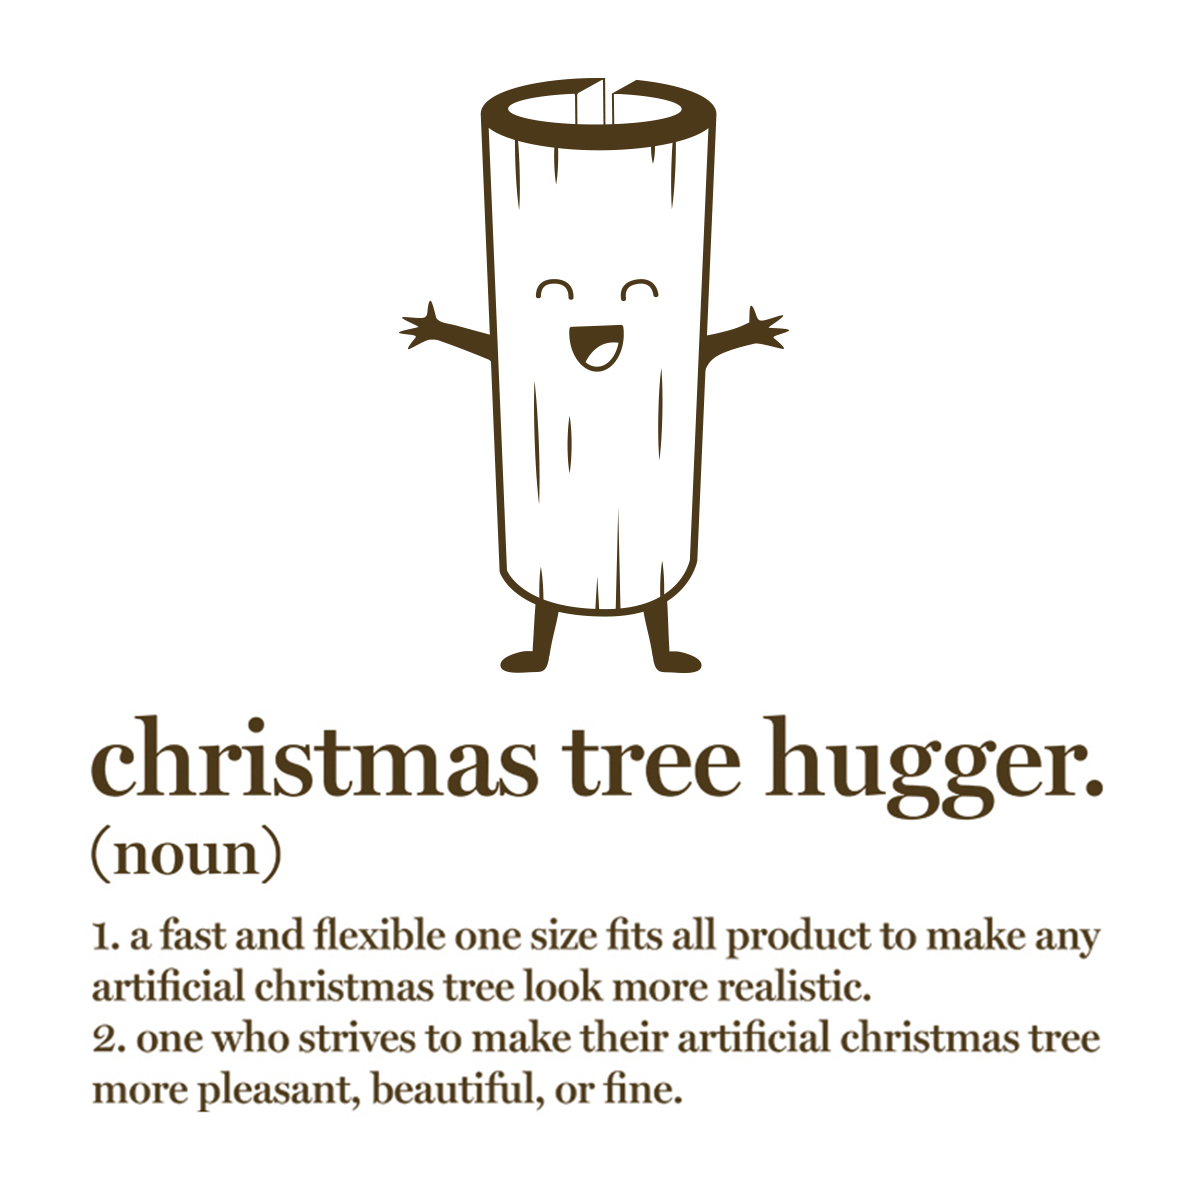 how-ryan-kenny-started-the-christmas-tree-hugger